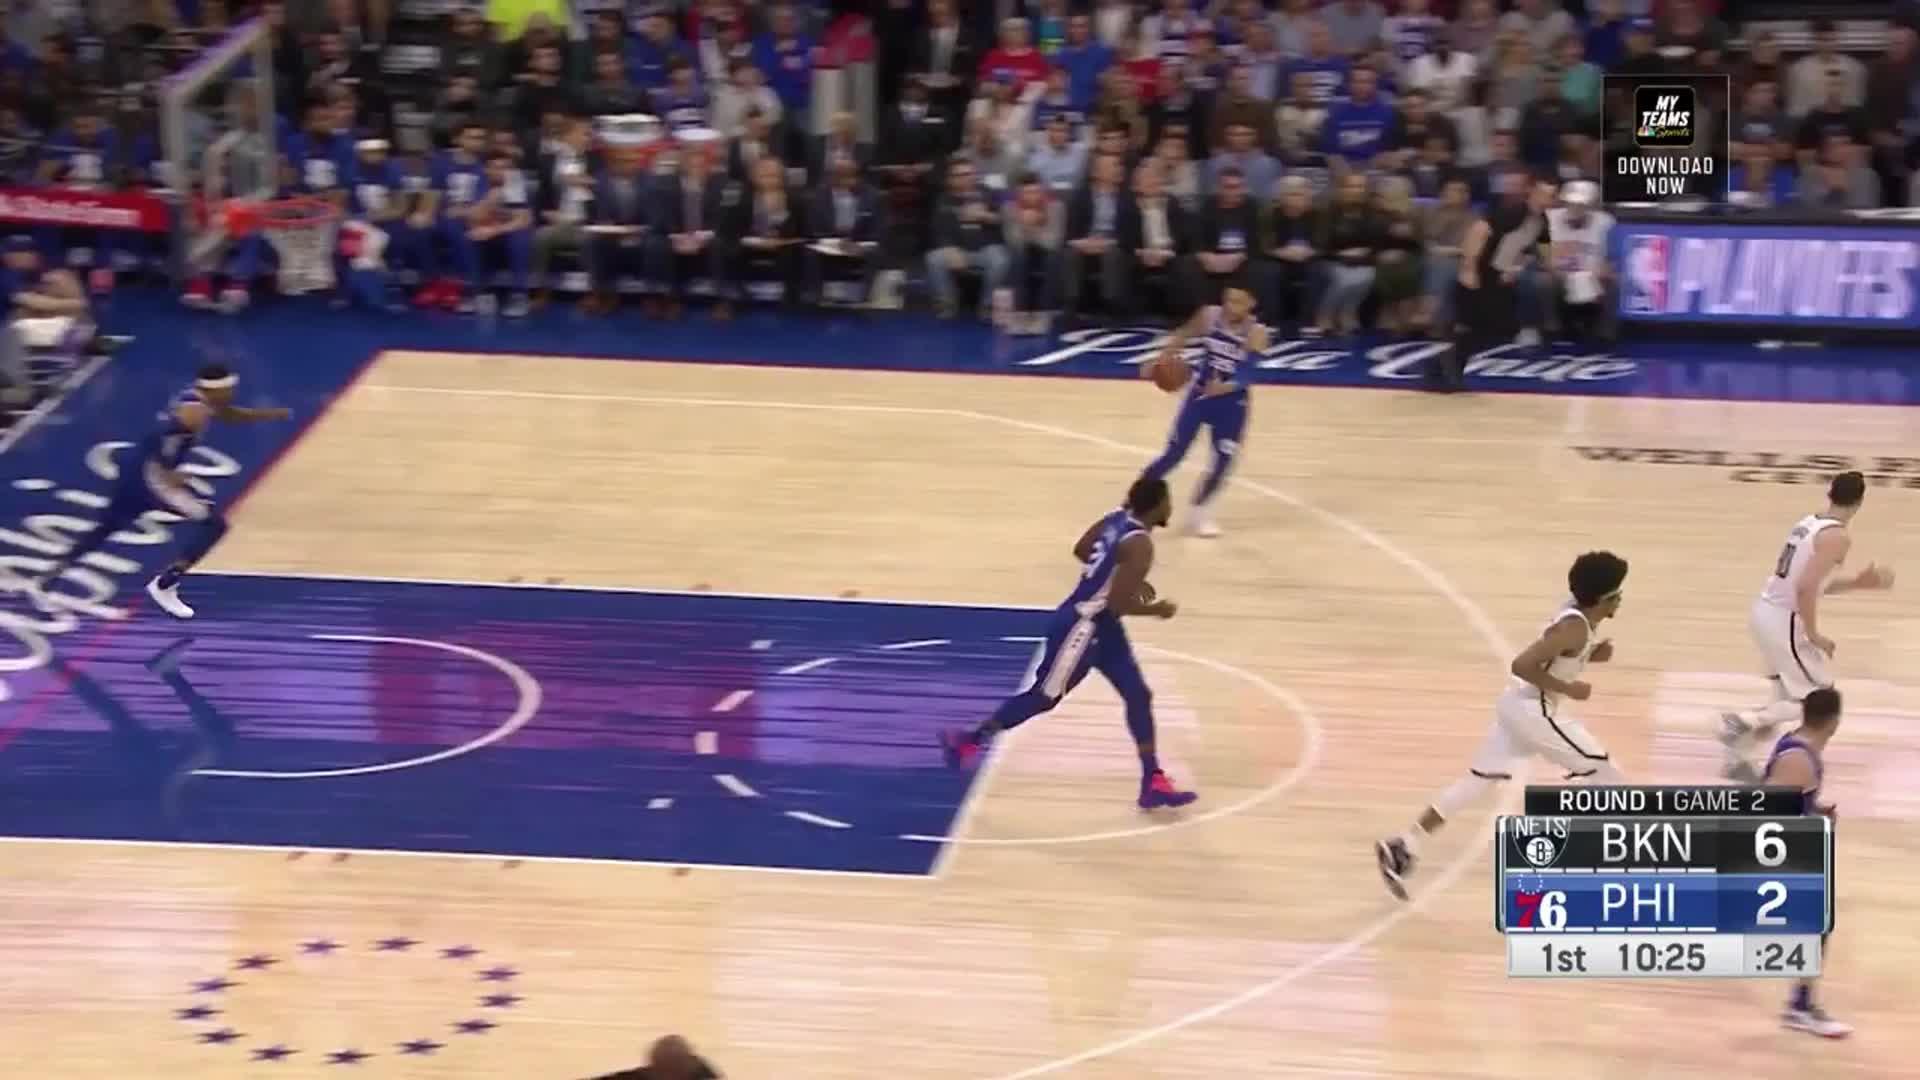 Ben Simmons, Brooklyn Nets, NBA, Philadelphia 76ers, basketball, Ben Simmons Transition drive-Nets no Dudley GIFs